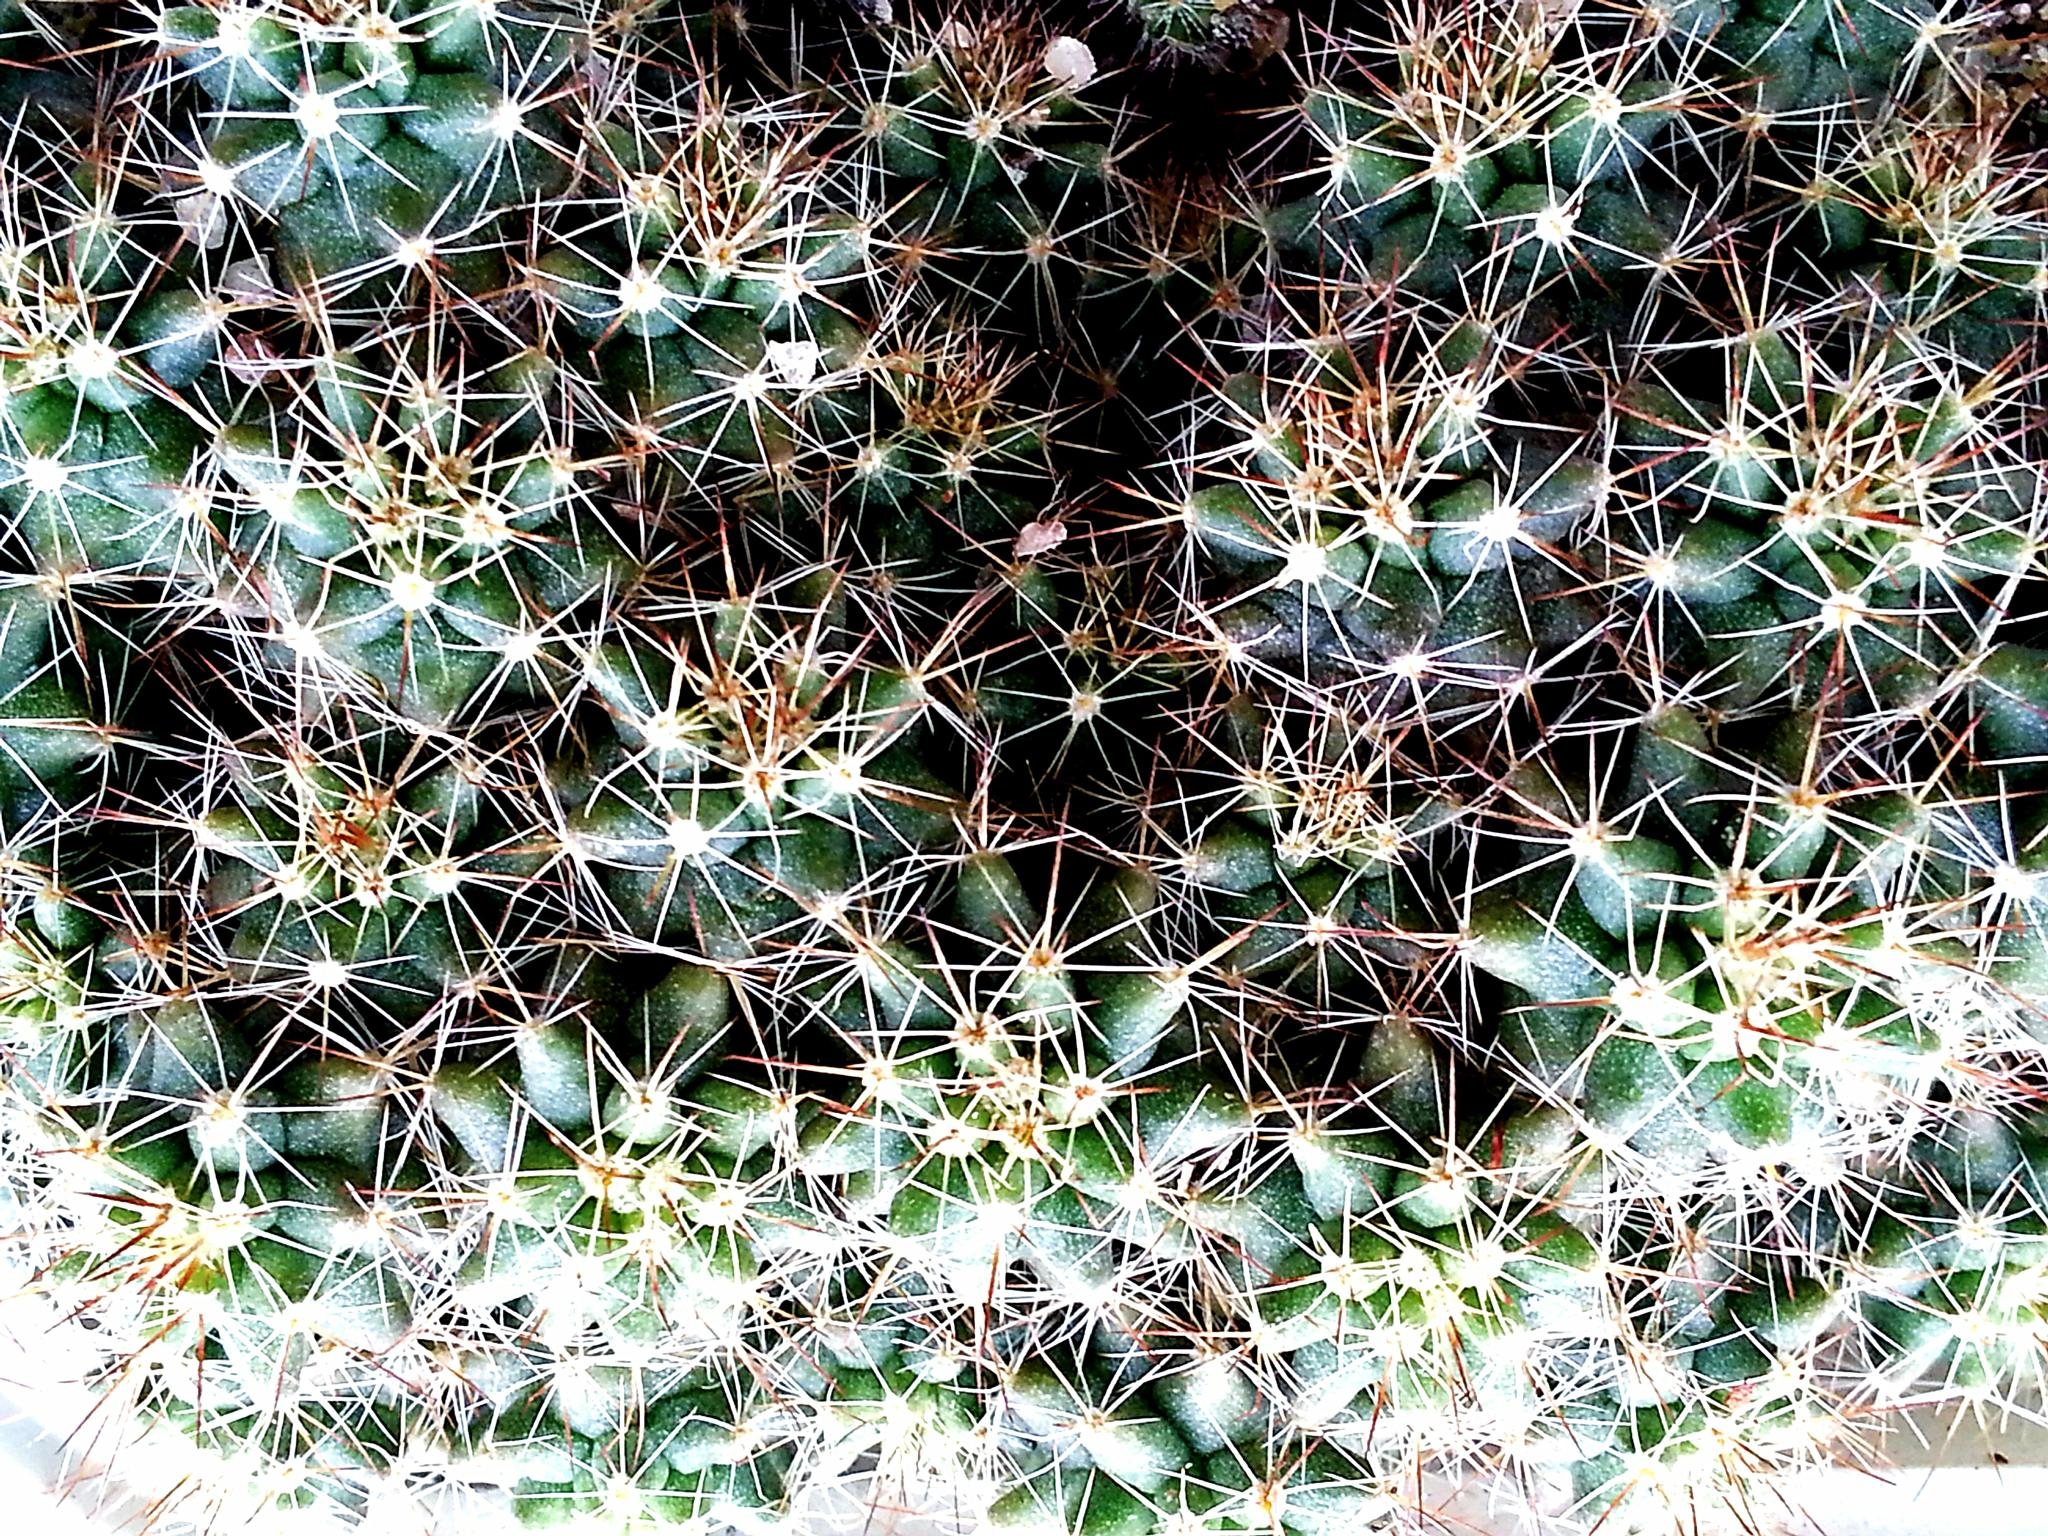 Baby cactus by jaraswong